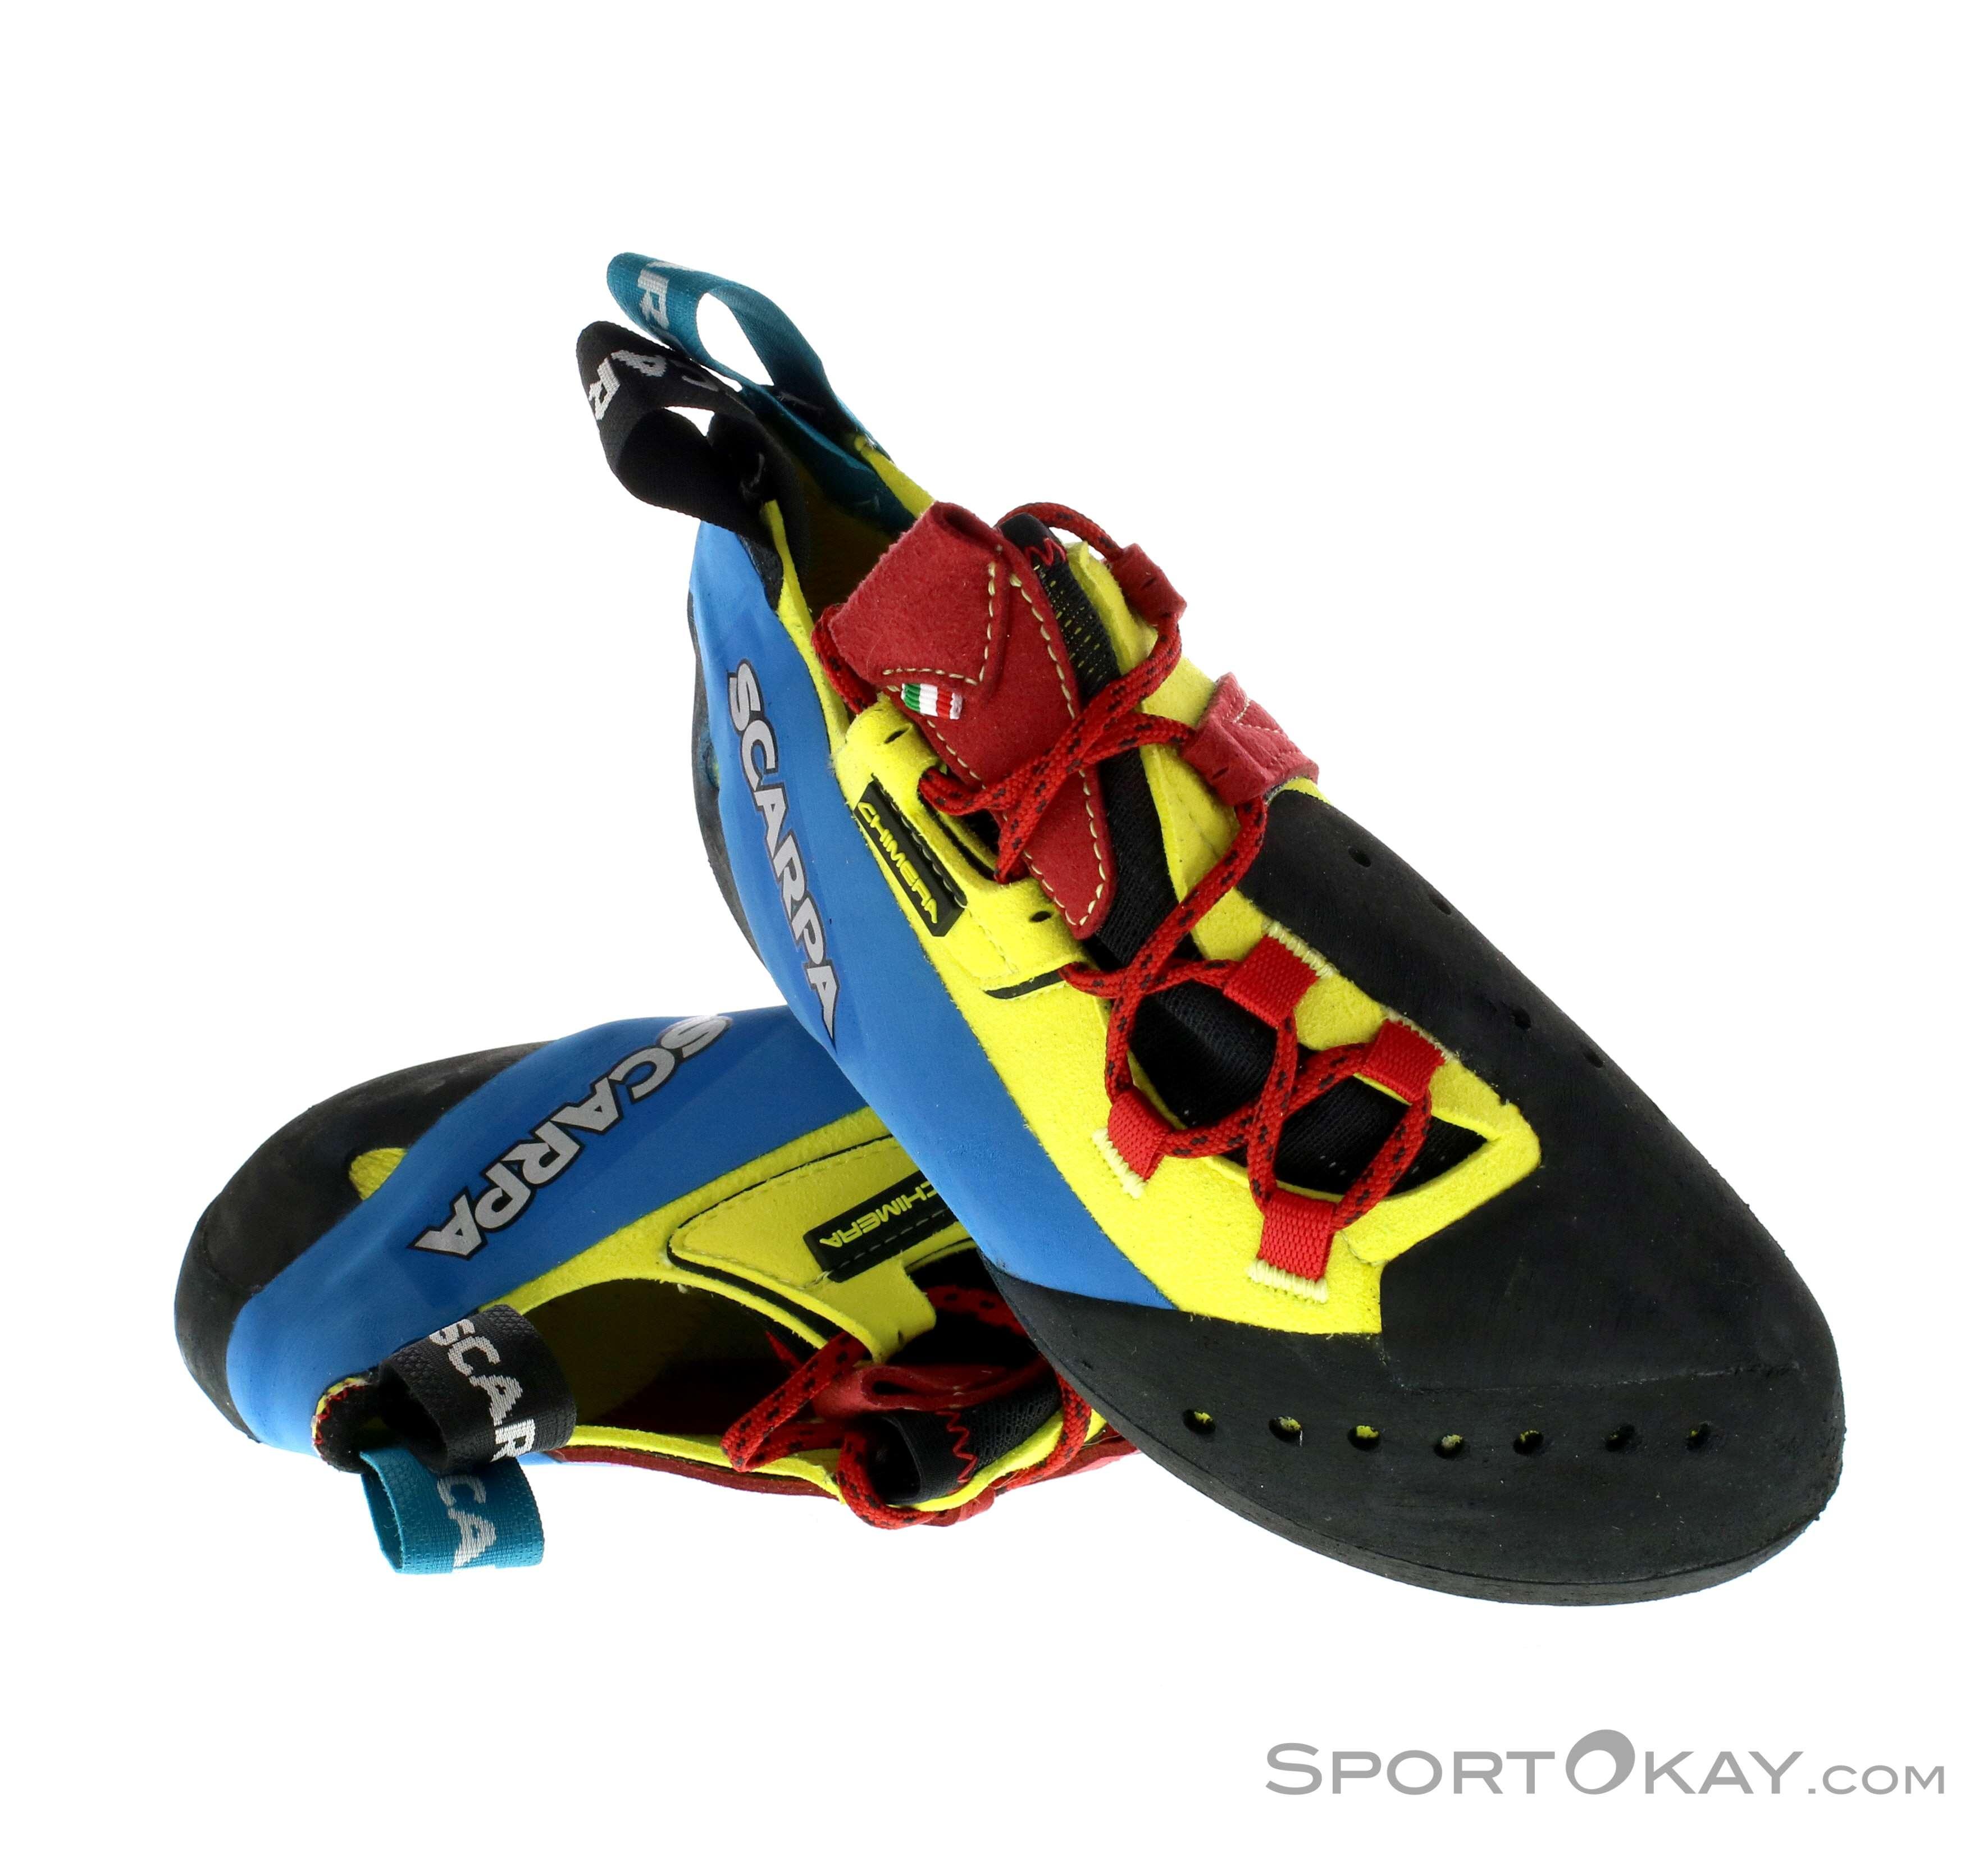 Scarpa Chimera Mens Climbing Shoes